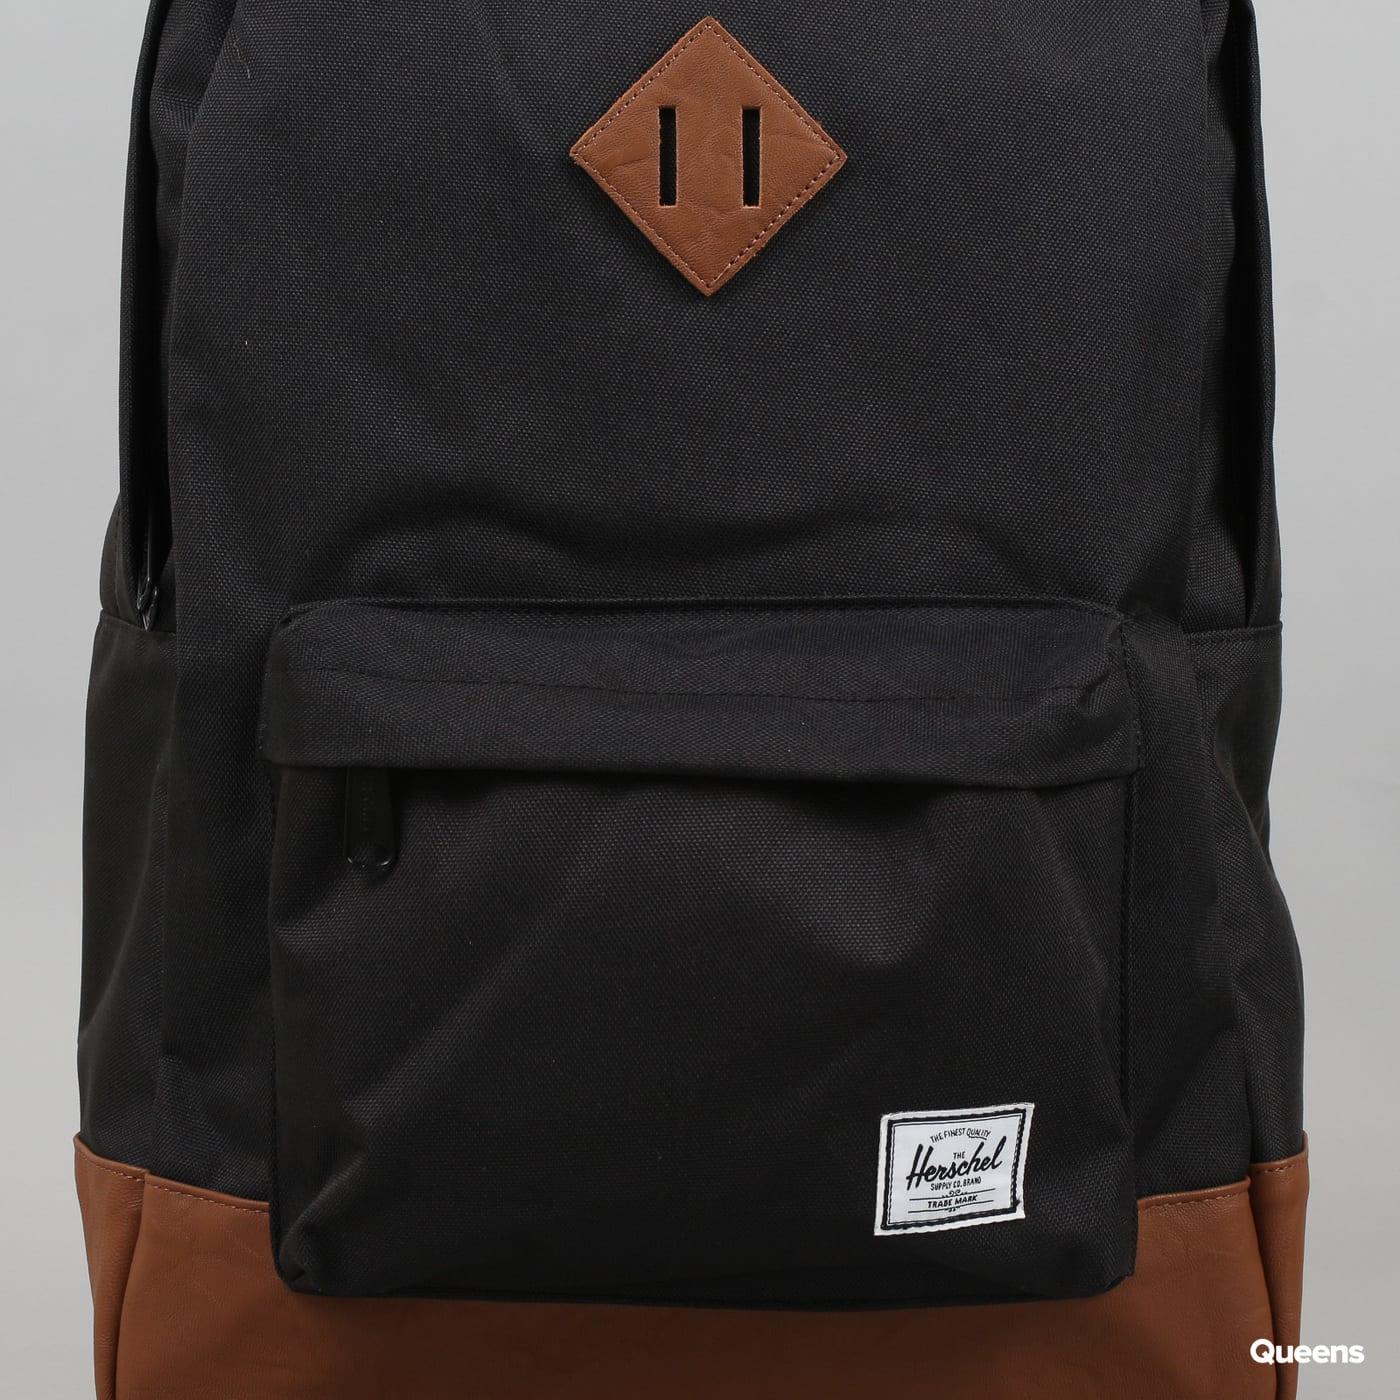 The Herschel Supply CO. Heritage Backpack čierny / hnedý